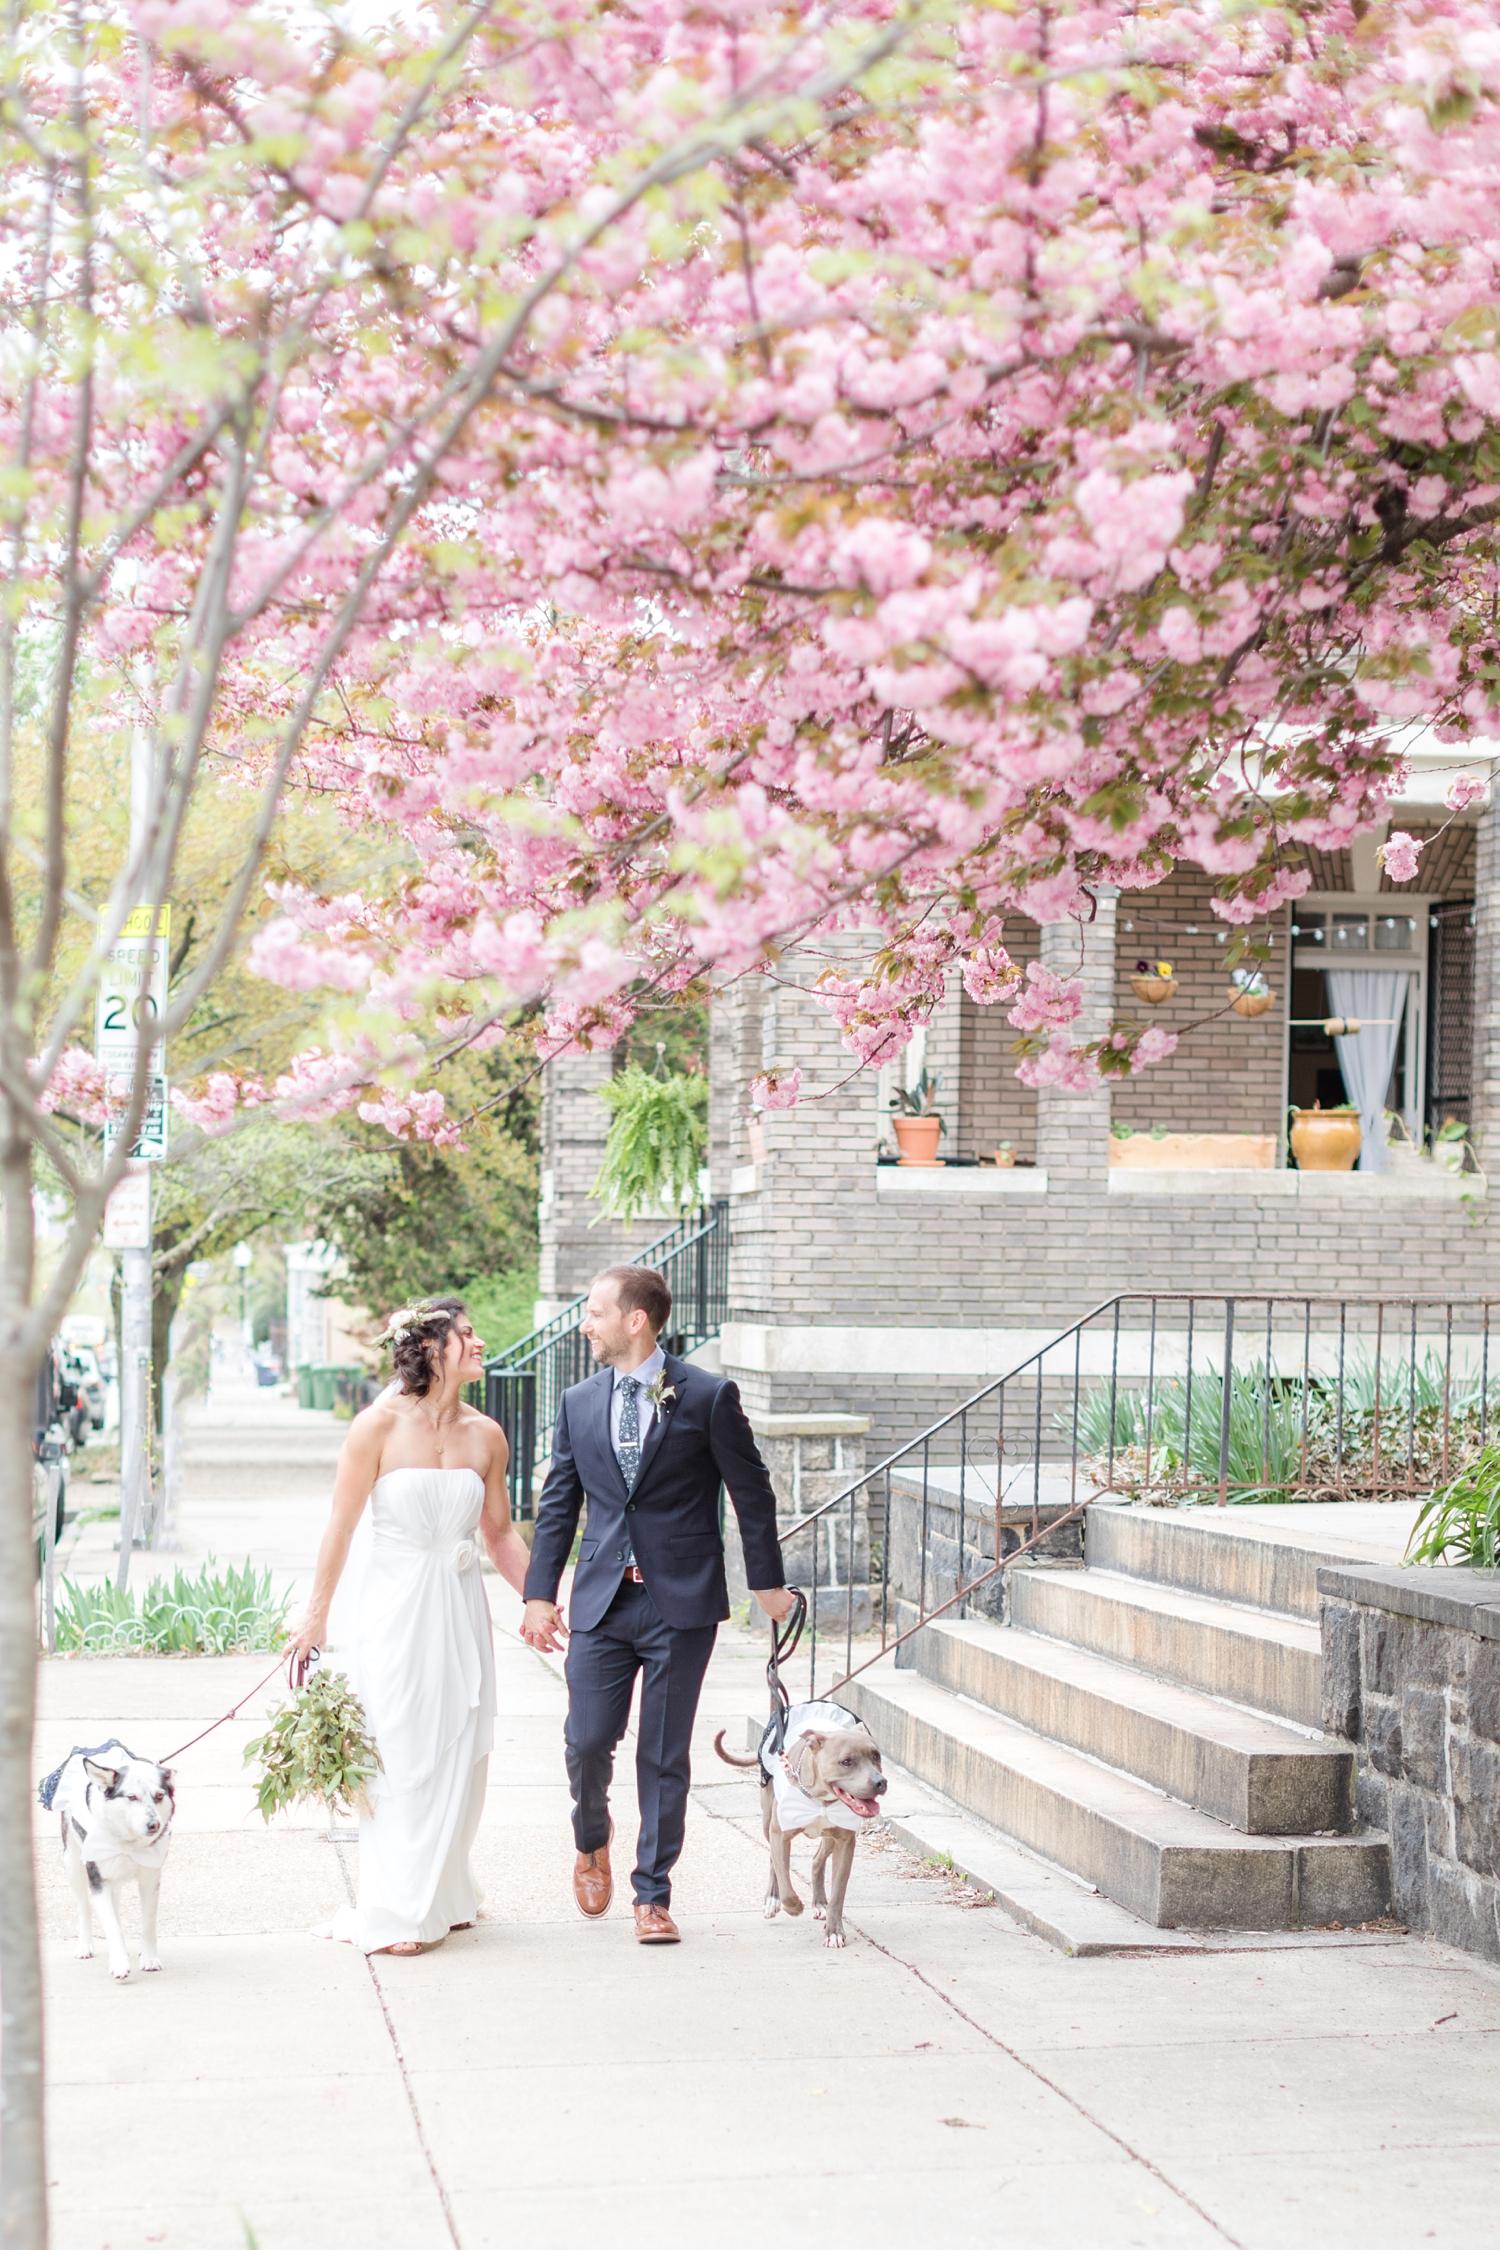 Matt & Angel Skarzynski Wedding WEDDING HIGHLIGHTS-150_2640-Space-wedding-Baltimore-Maryland-wedding-photographer-Patapsco-State-Park-engagement-anna-grace-photography-photo.jpg